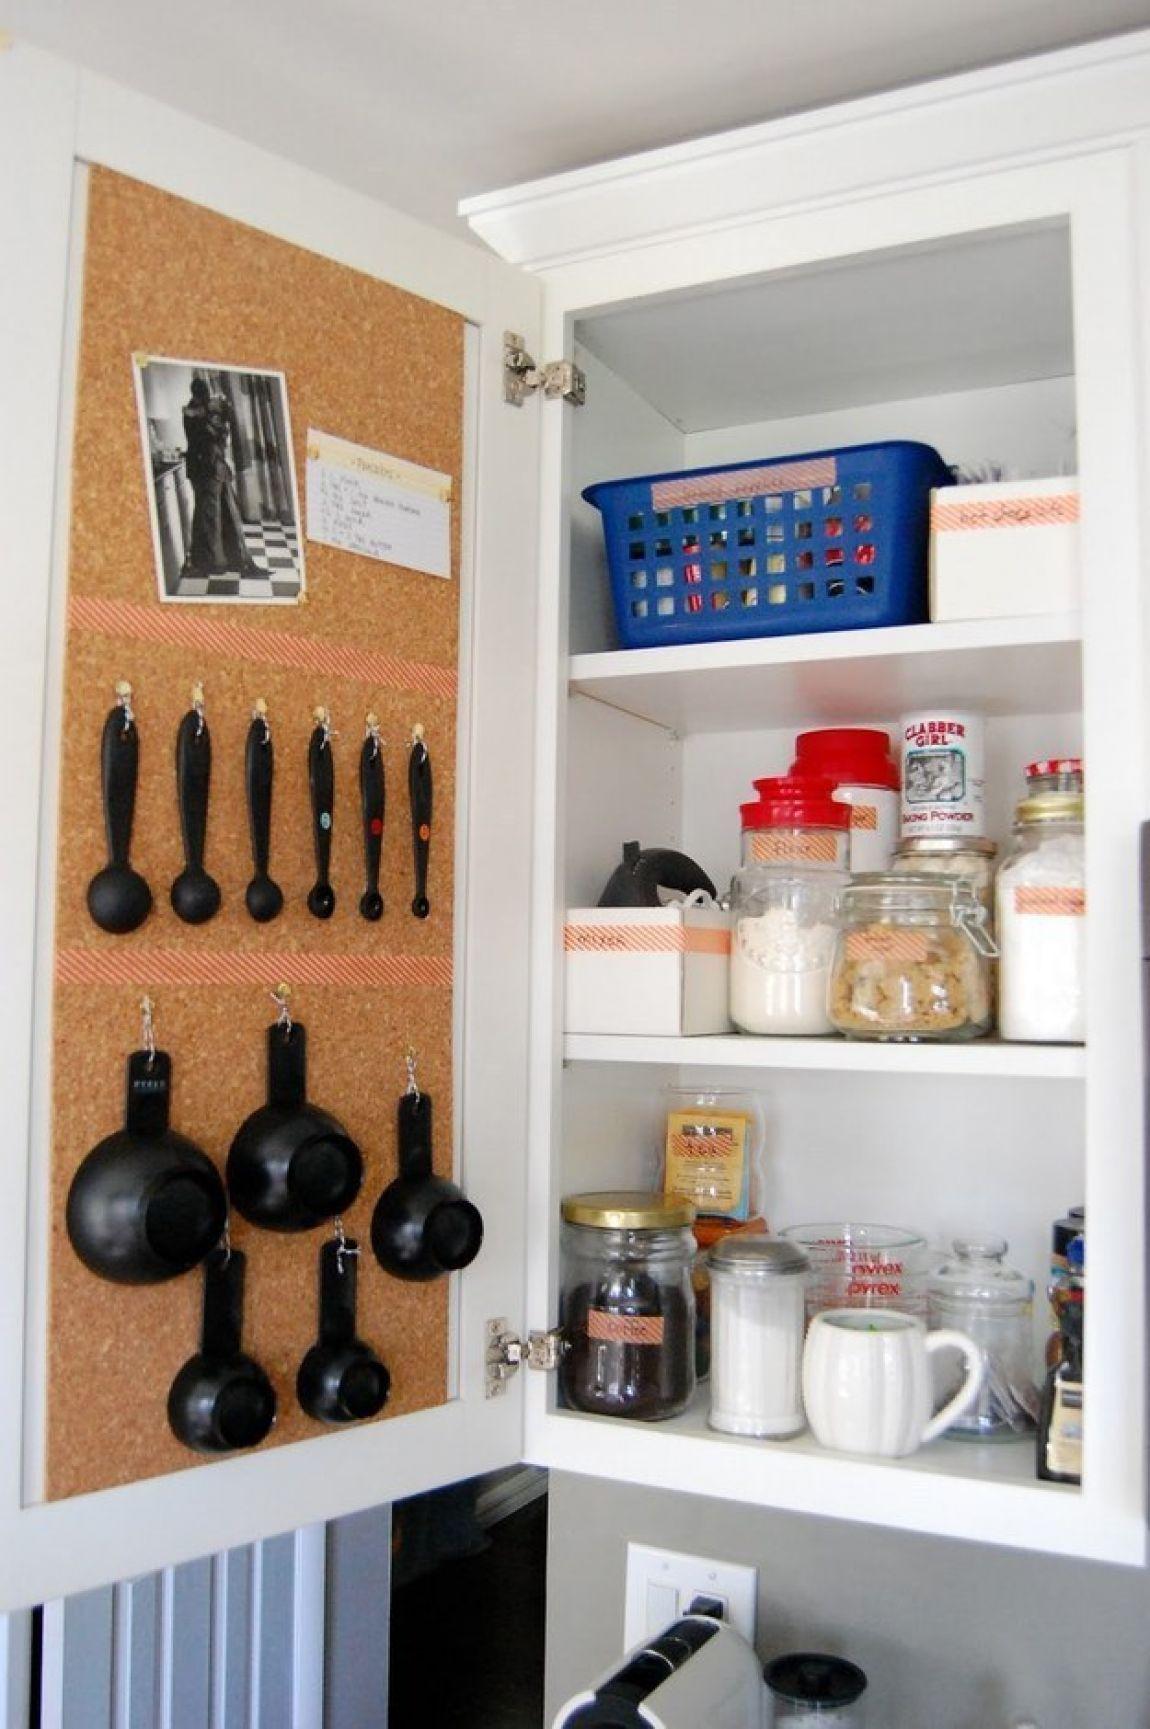 11 Kitchen Storage Spots You Completely Forgot About Kitchen Hacks Organization Kitchen Organization Home Organization